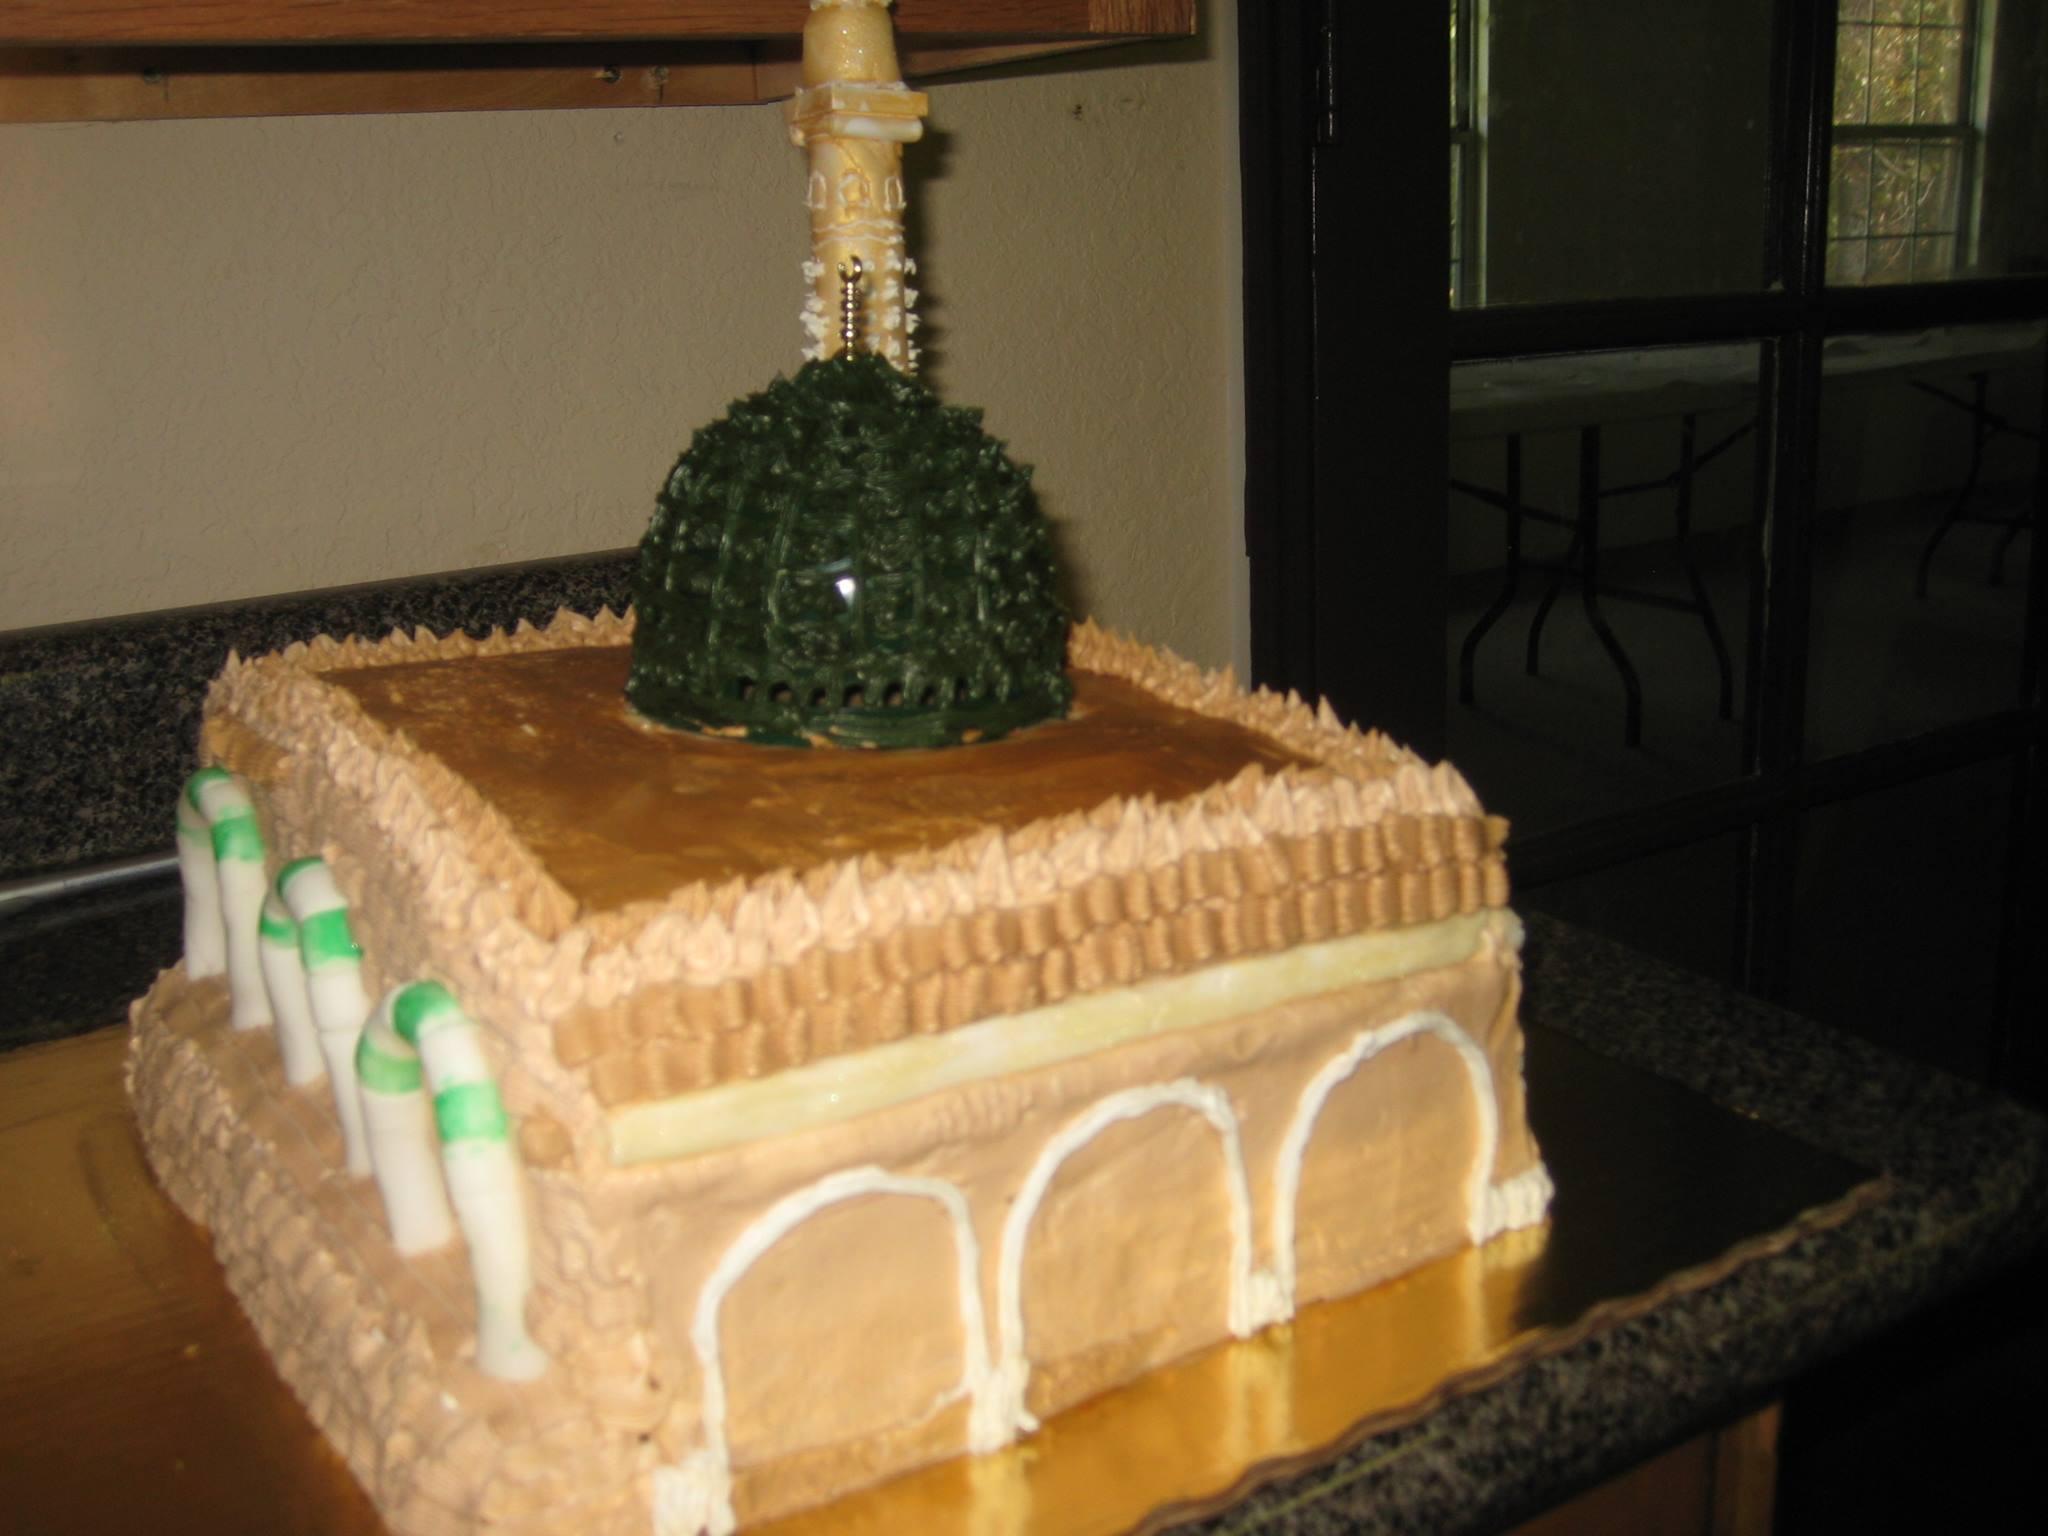 Prophet's Cake Pictures!